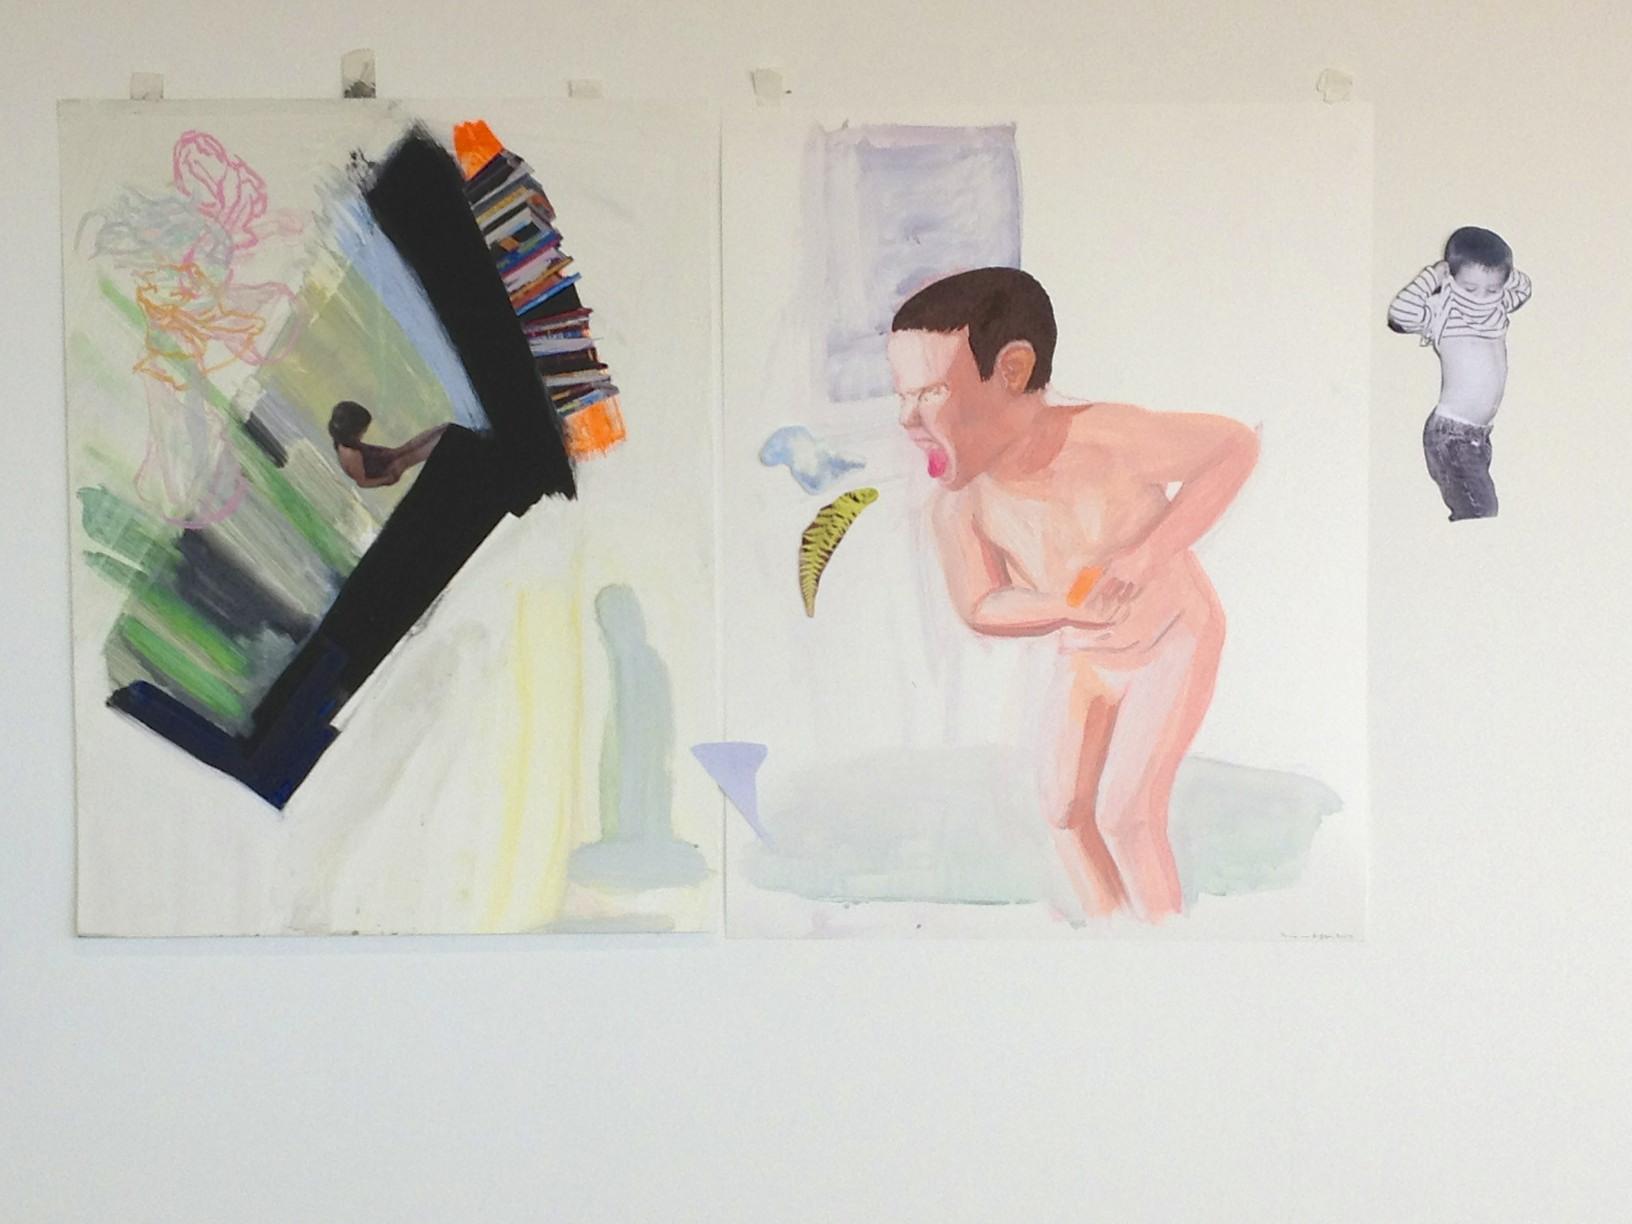 "Quiet/Loud Mixed media on Yupo paper, Digital prints 46"" x 26"" 2013"